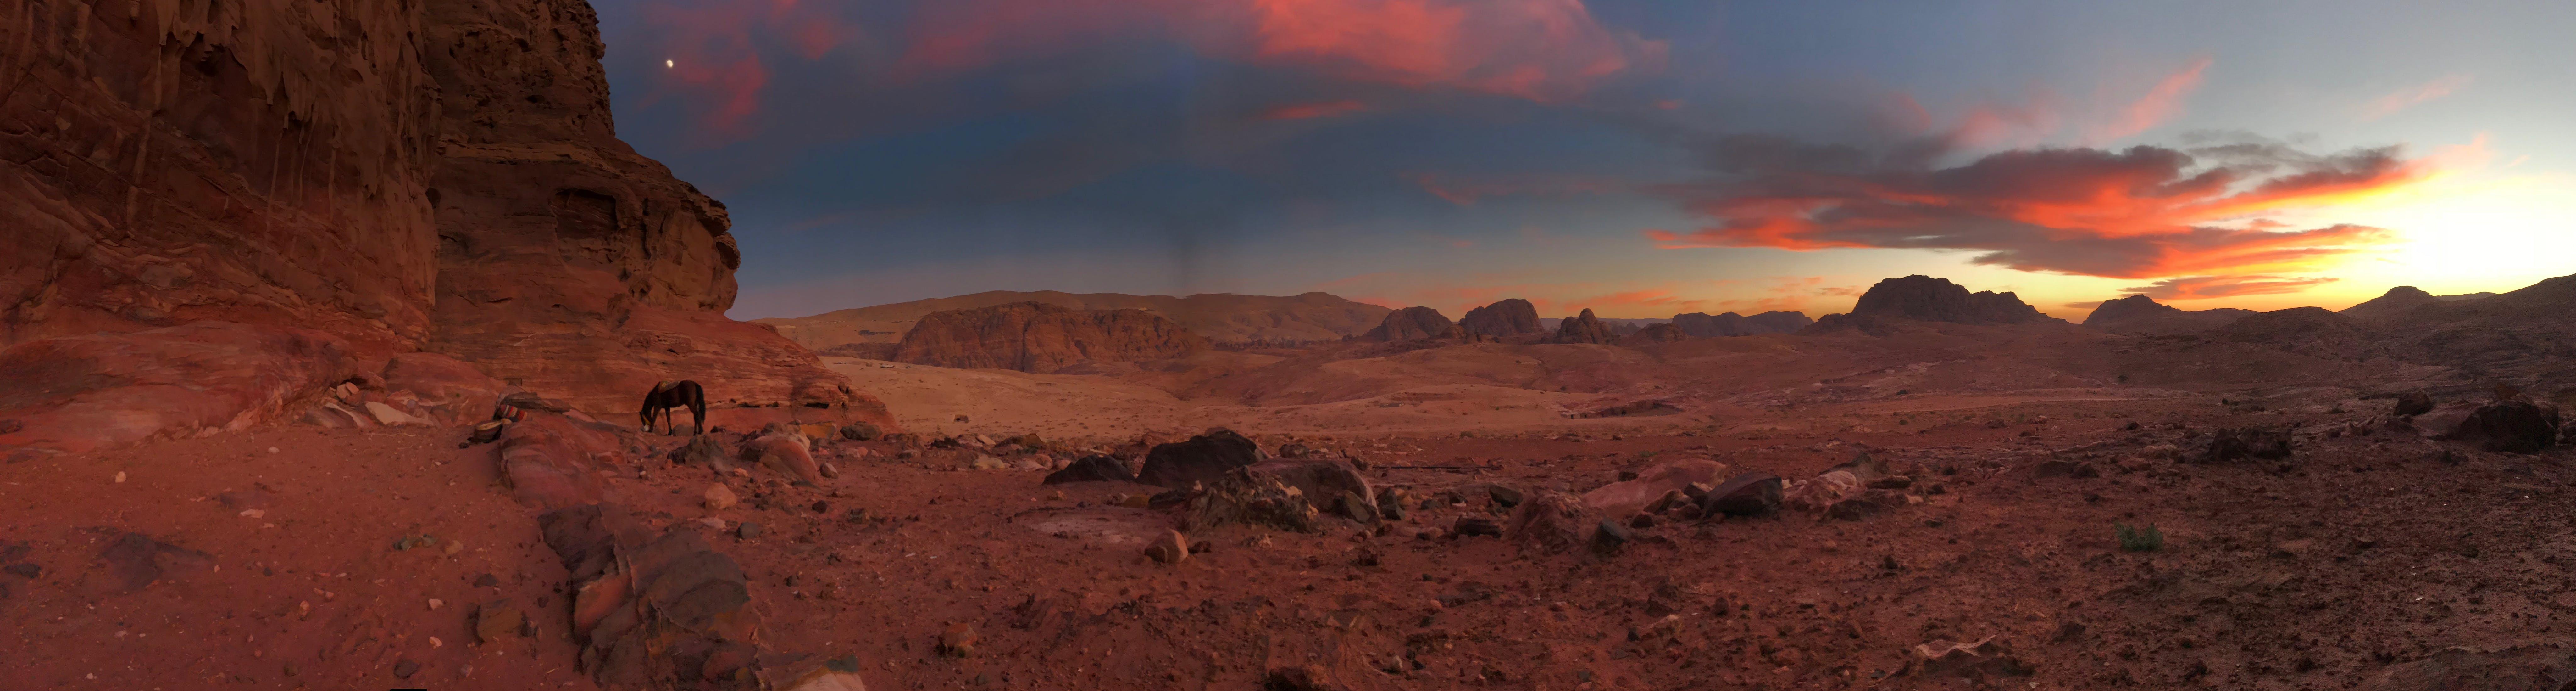 Panoramic Photo of Rocky Mountain